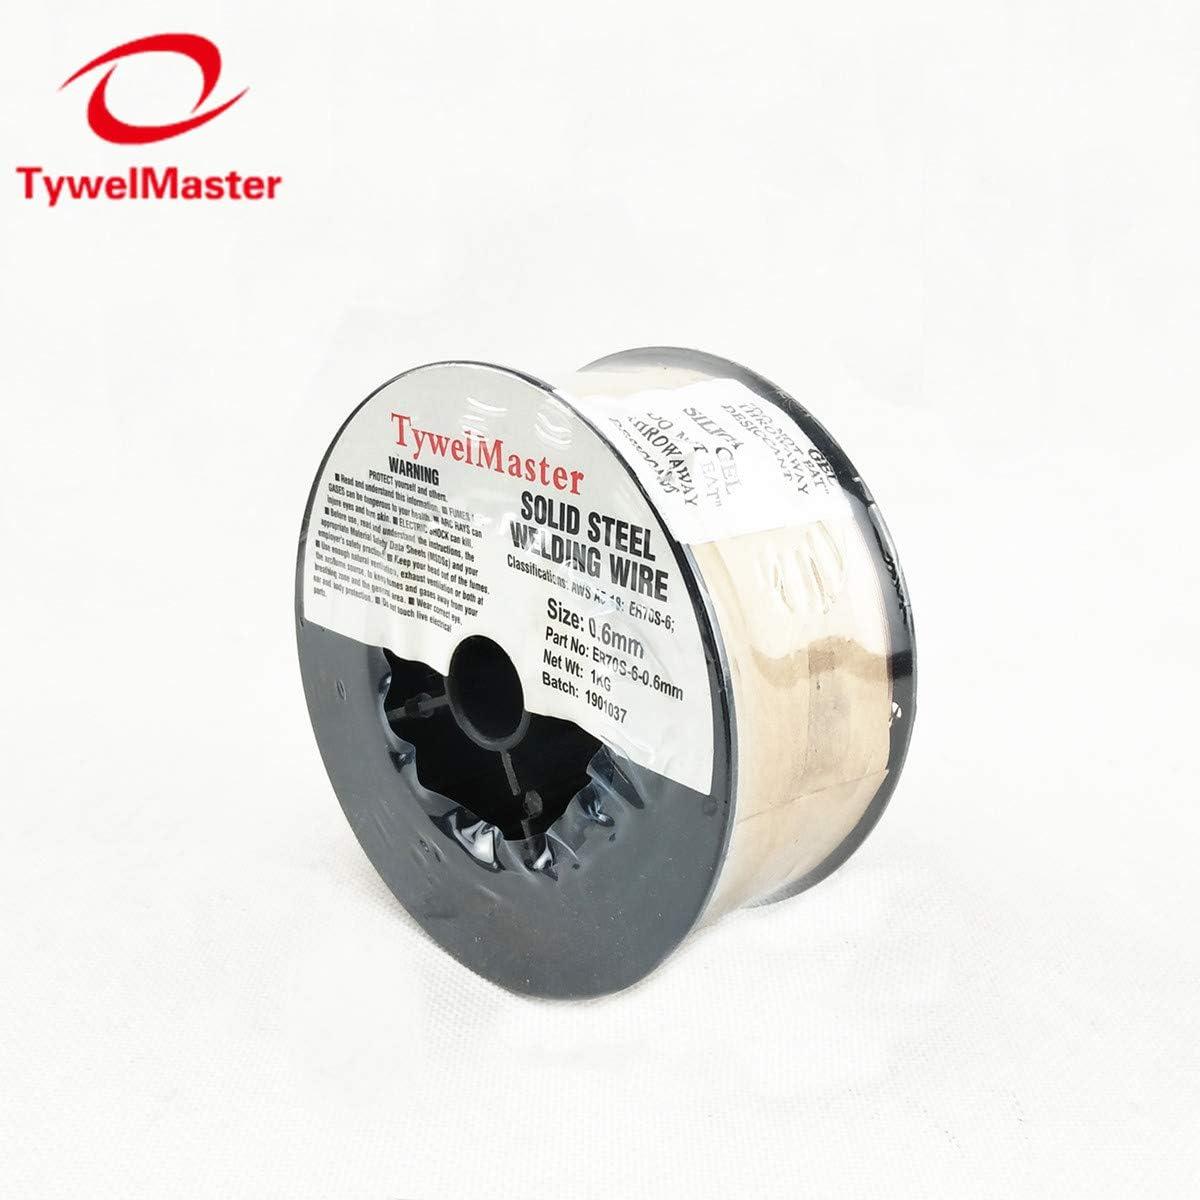 1KG #1#2 Mini Spool 0.6mm 0.023 MIG Welding Wire ER70S-6 SG2 ER50-6 0.6//0.8//0.9mm 0.023//0.03//0.035 Steel Solid Welding Material